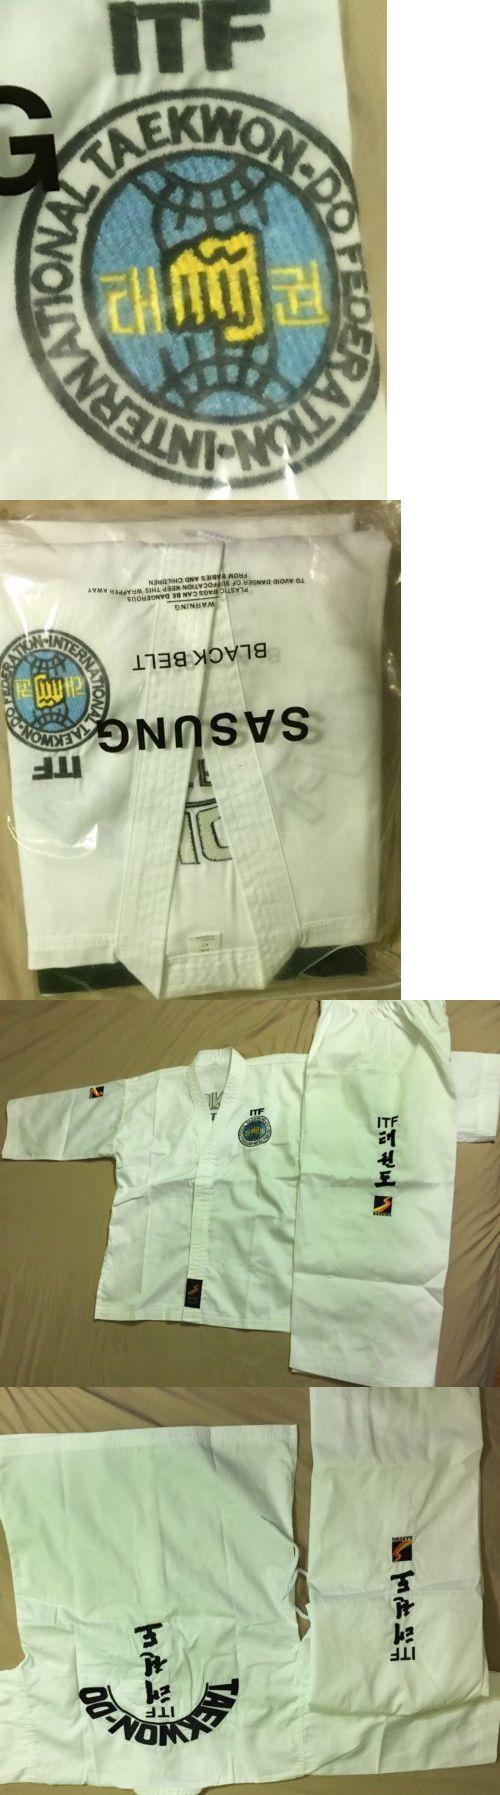 Other Combat Sport Clothing 73988: Sasung Itf Taekwondo Uniform For The World Championships -> BUY IT NOW ONLY: $85 on eBay!